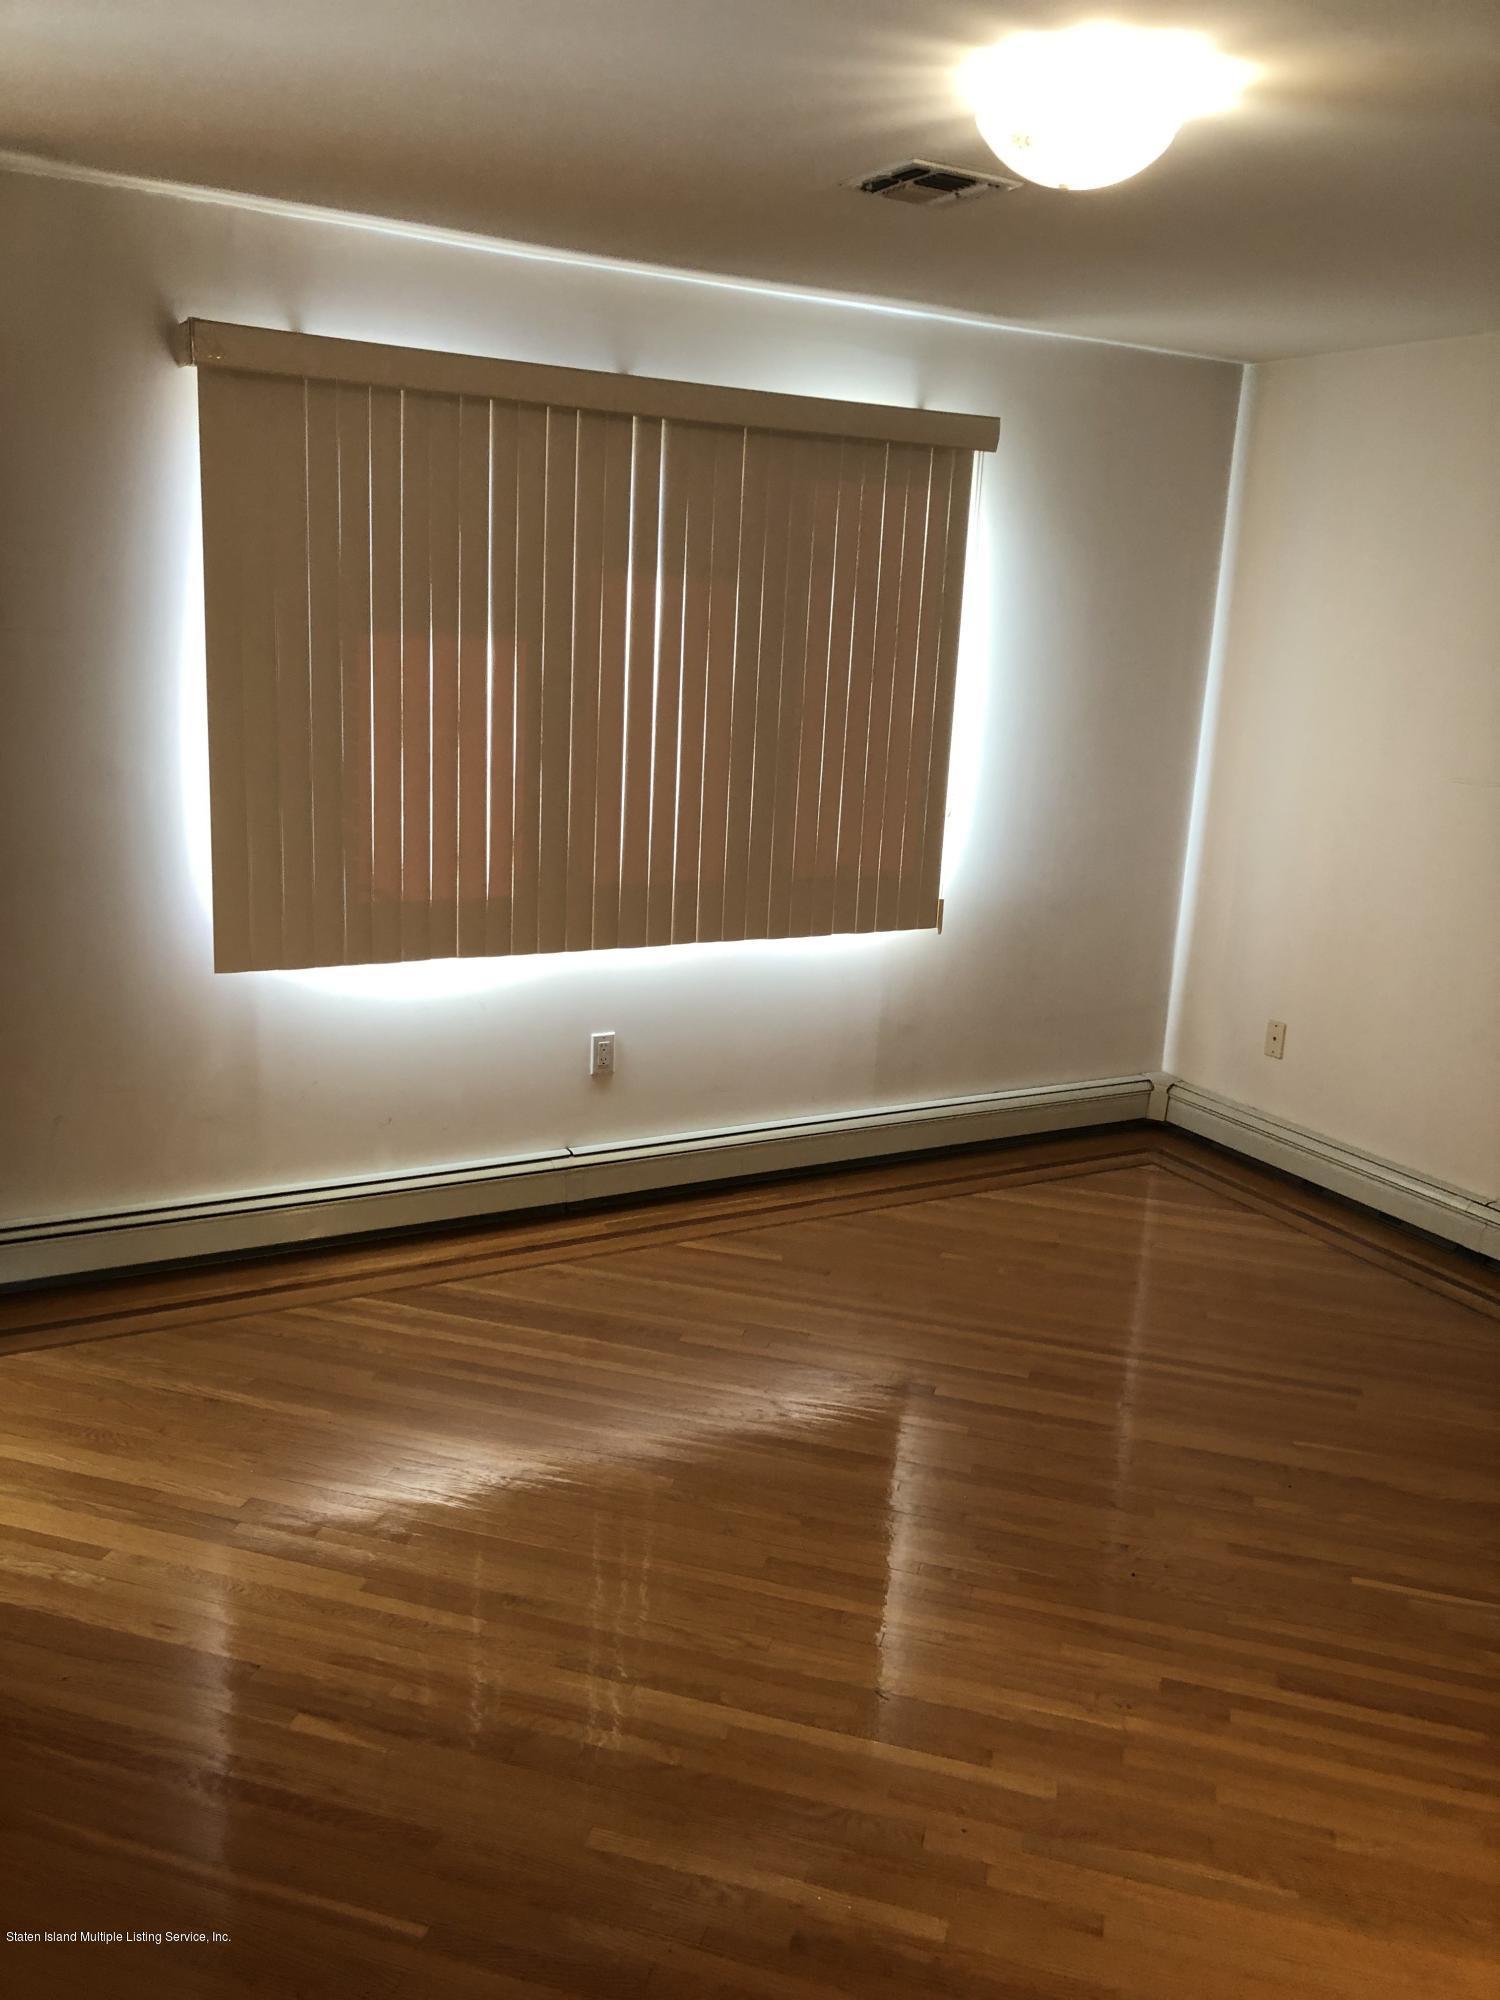 557 Ionia Avenue,Staten Island,New York,10312,United States,3 Bedrooms Bedrooms,7 Rooms Rooms,4 BathroomsBathrooms,Res-Rental,Ionia,1135360